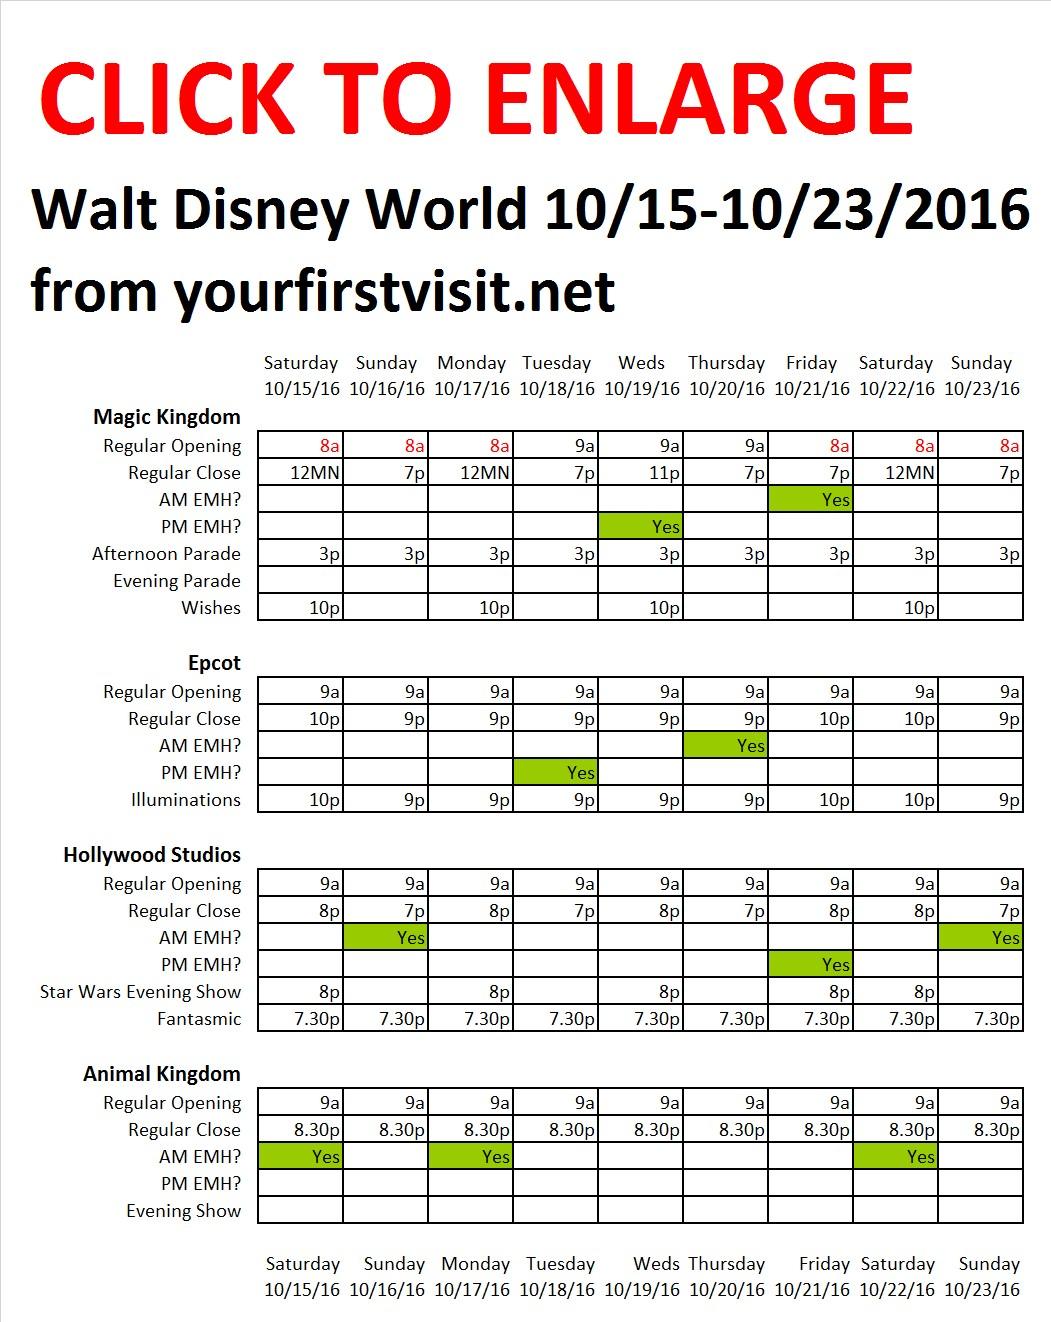 disney-world-10-15-to-10-23-2016-from-yourfirstvisit-net